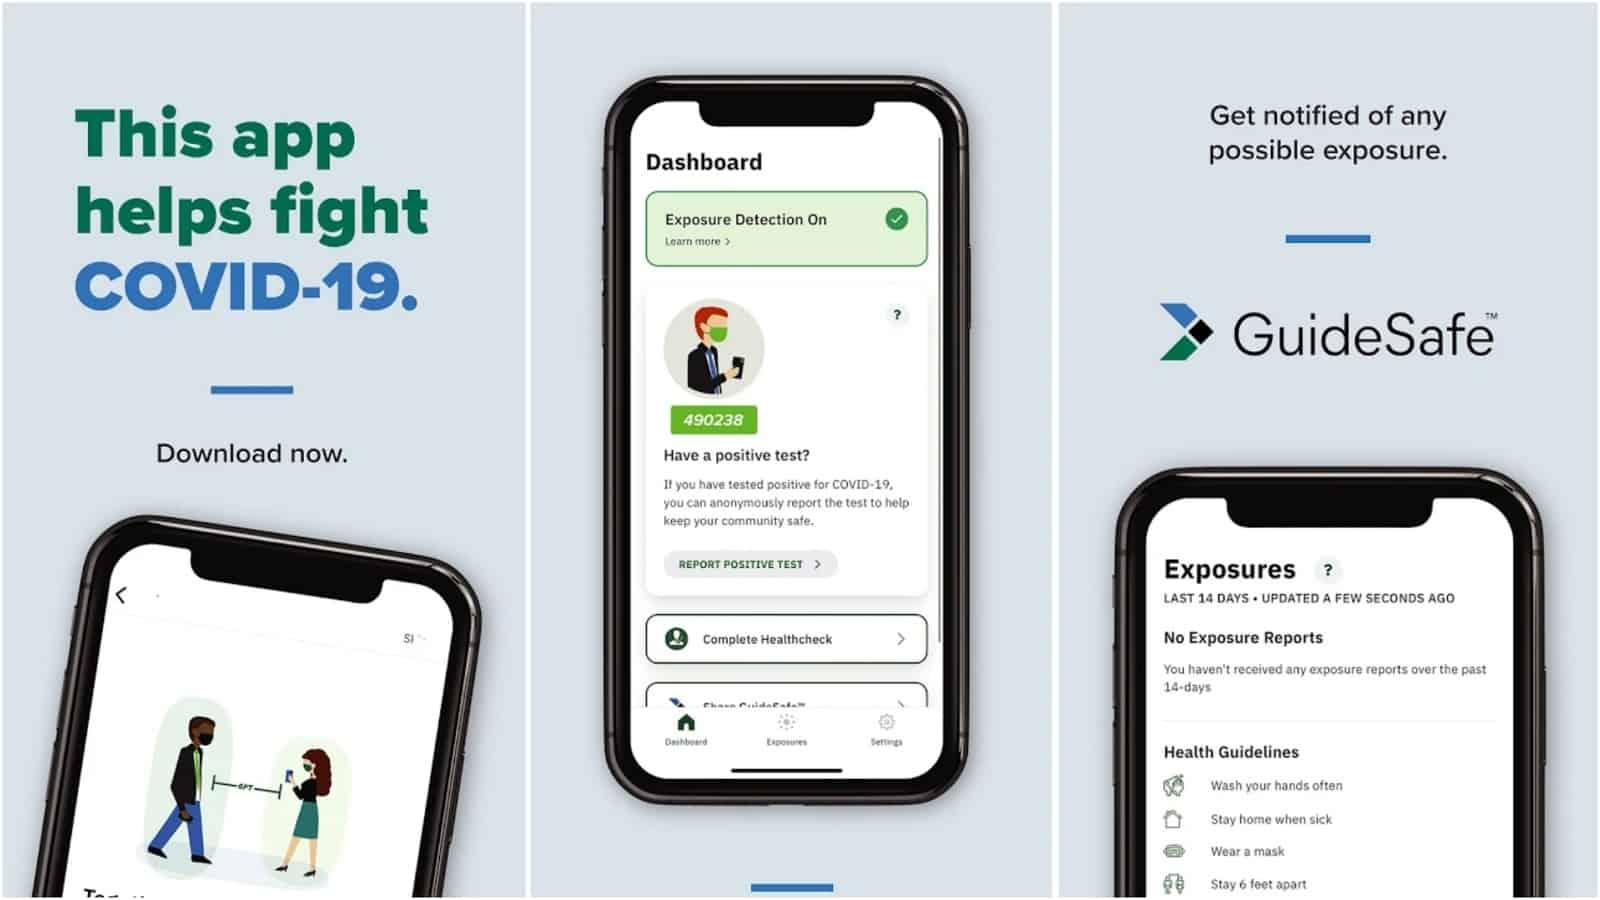 GuideSafe app grid image